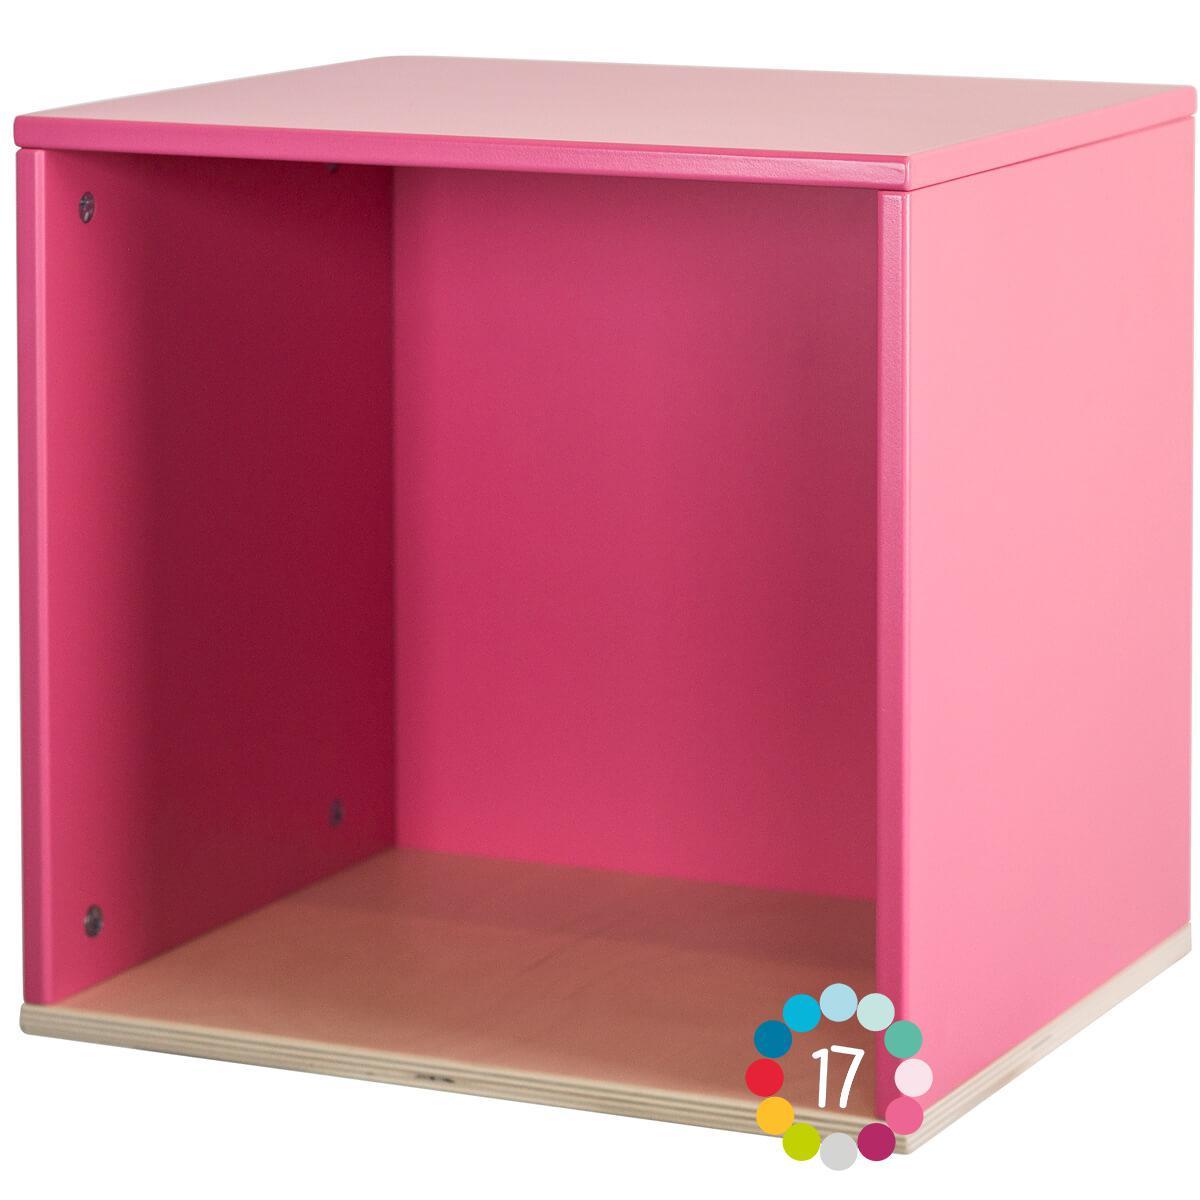 Cube mural COLORFLEX pink